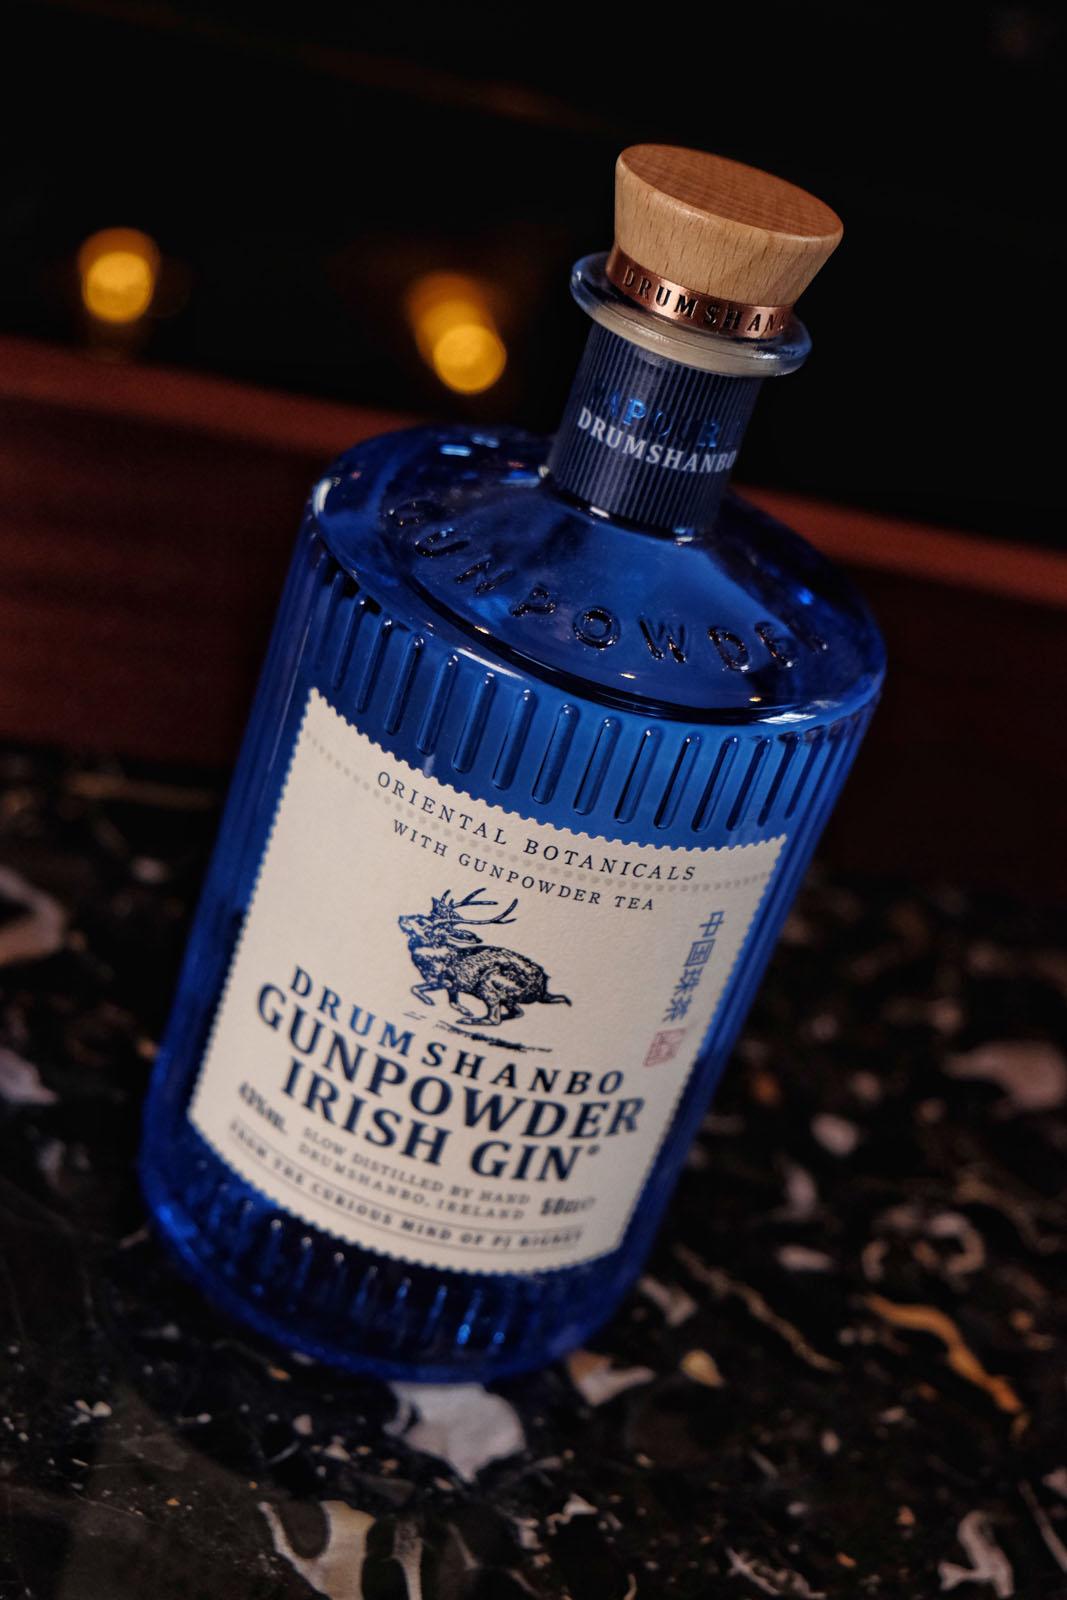 Drumshanbo Gunpowder Irish gin mood